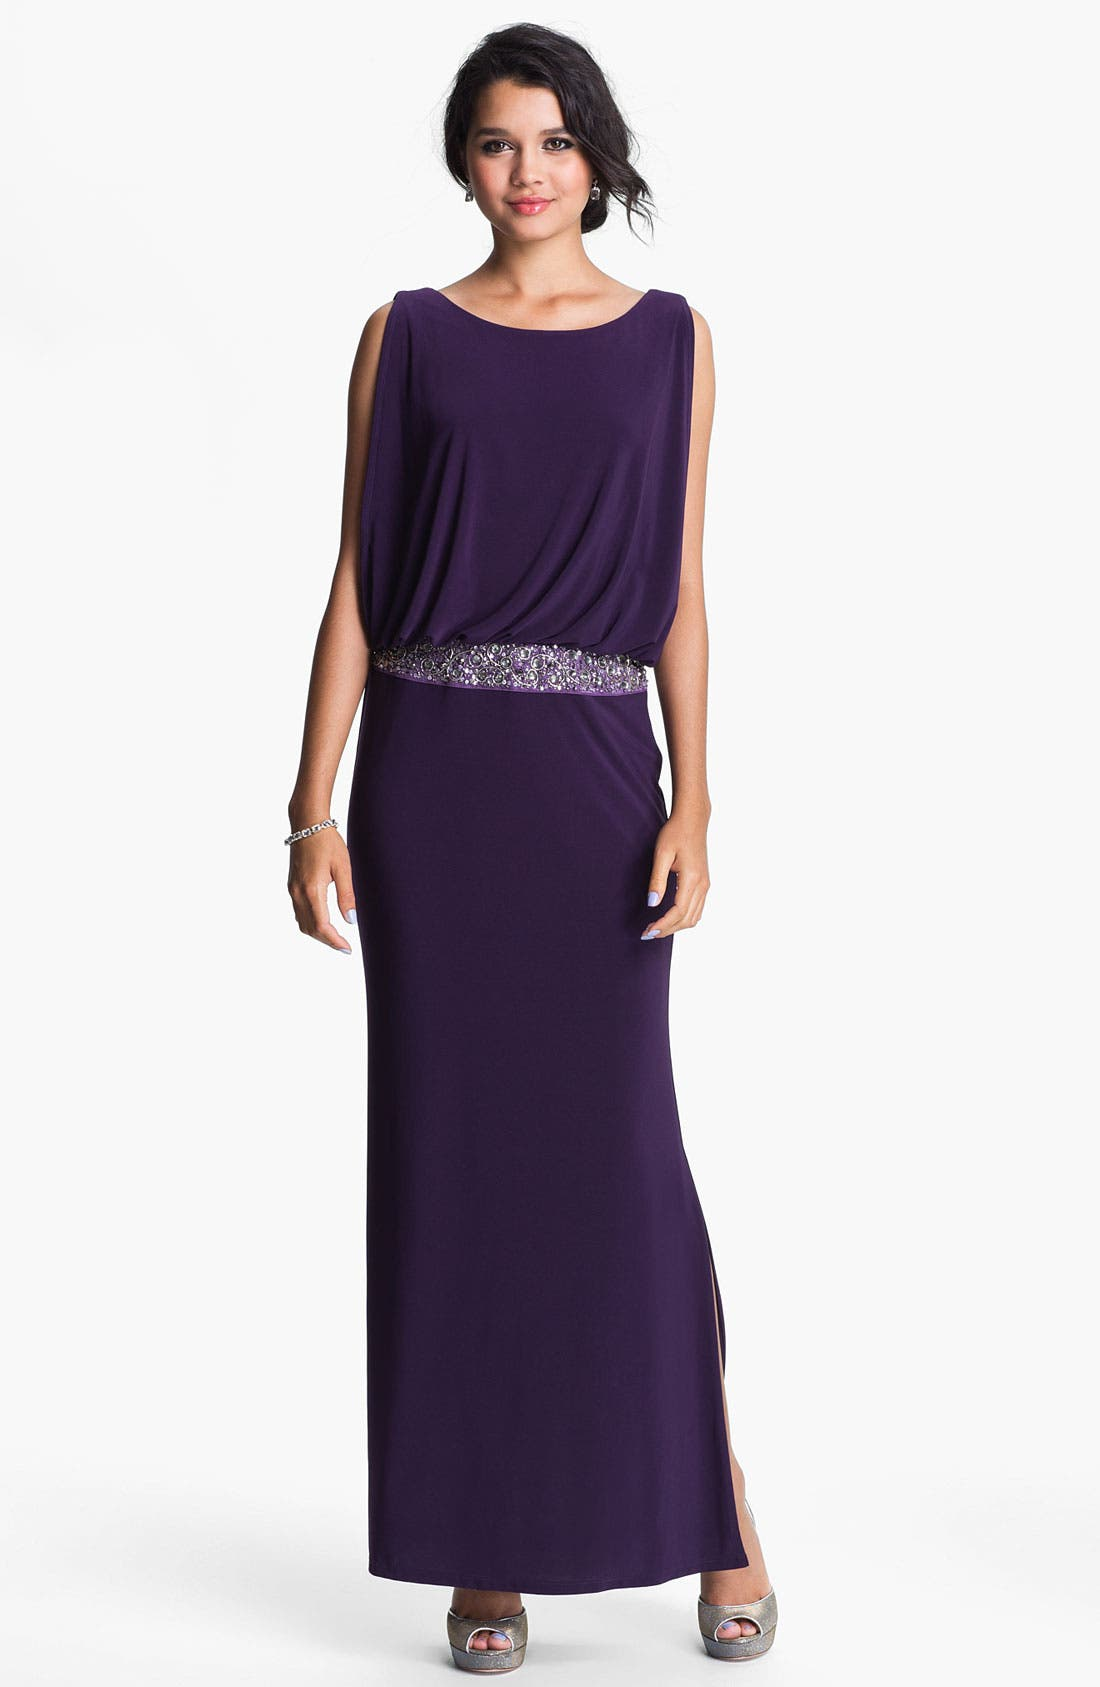 Main Image - JS Boutique Back Keyhole Embellished Blouson Jersey Gown